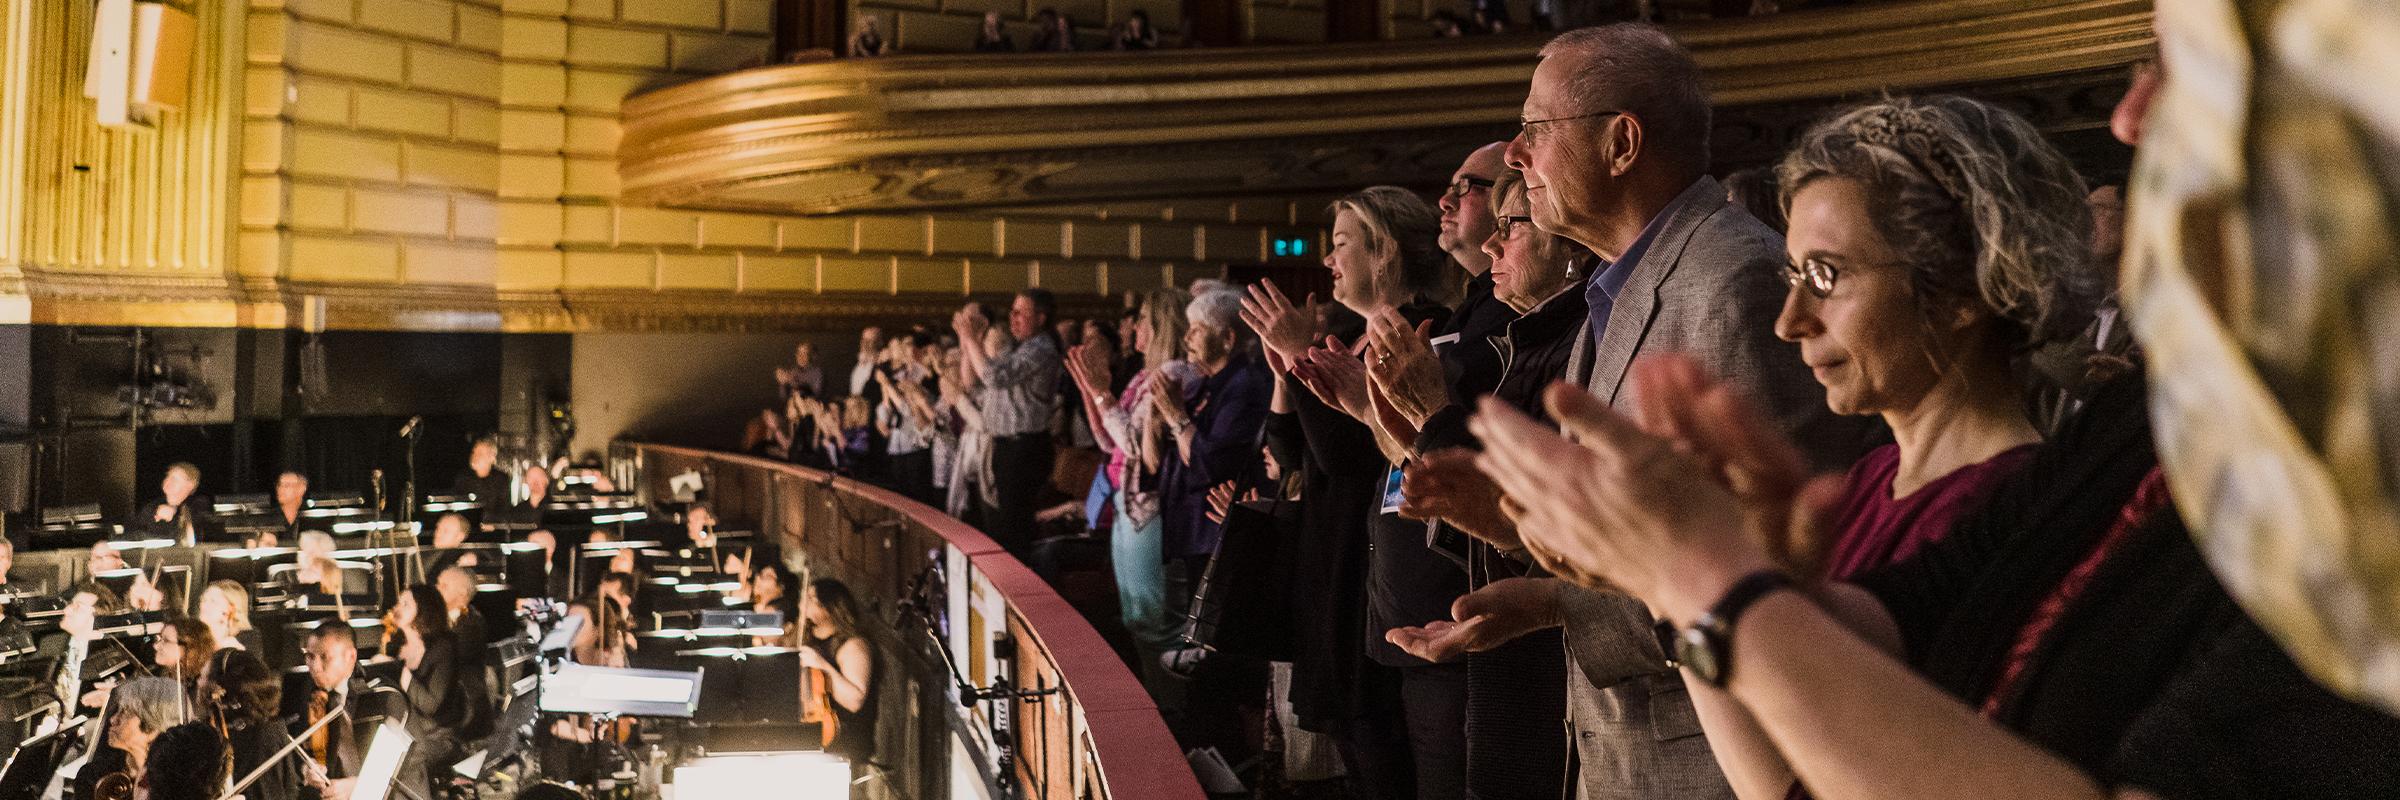 Patrons attending a performance of the San Francisco Ballet \\ © Brandon Patoc